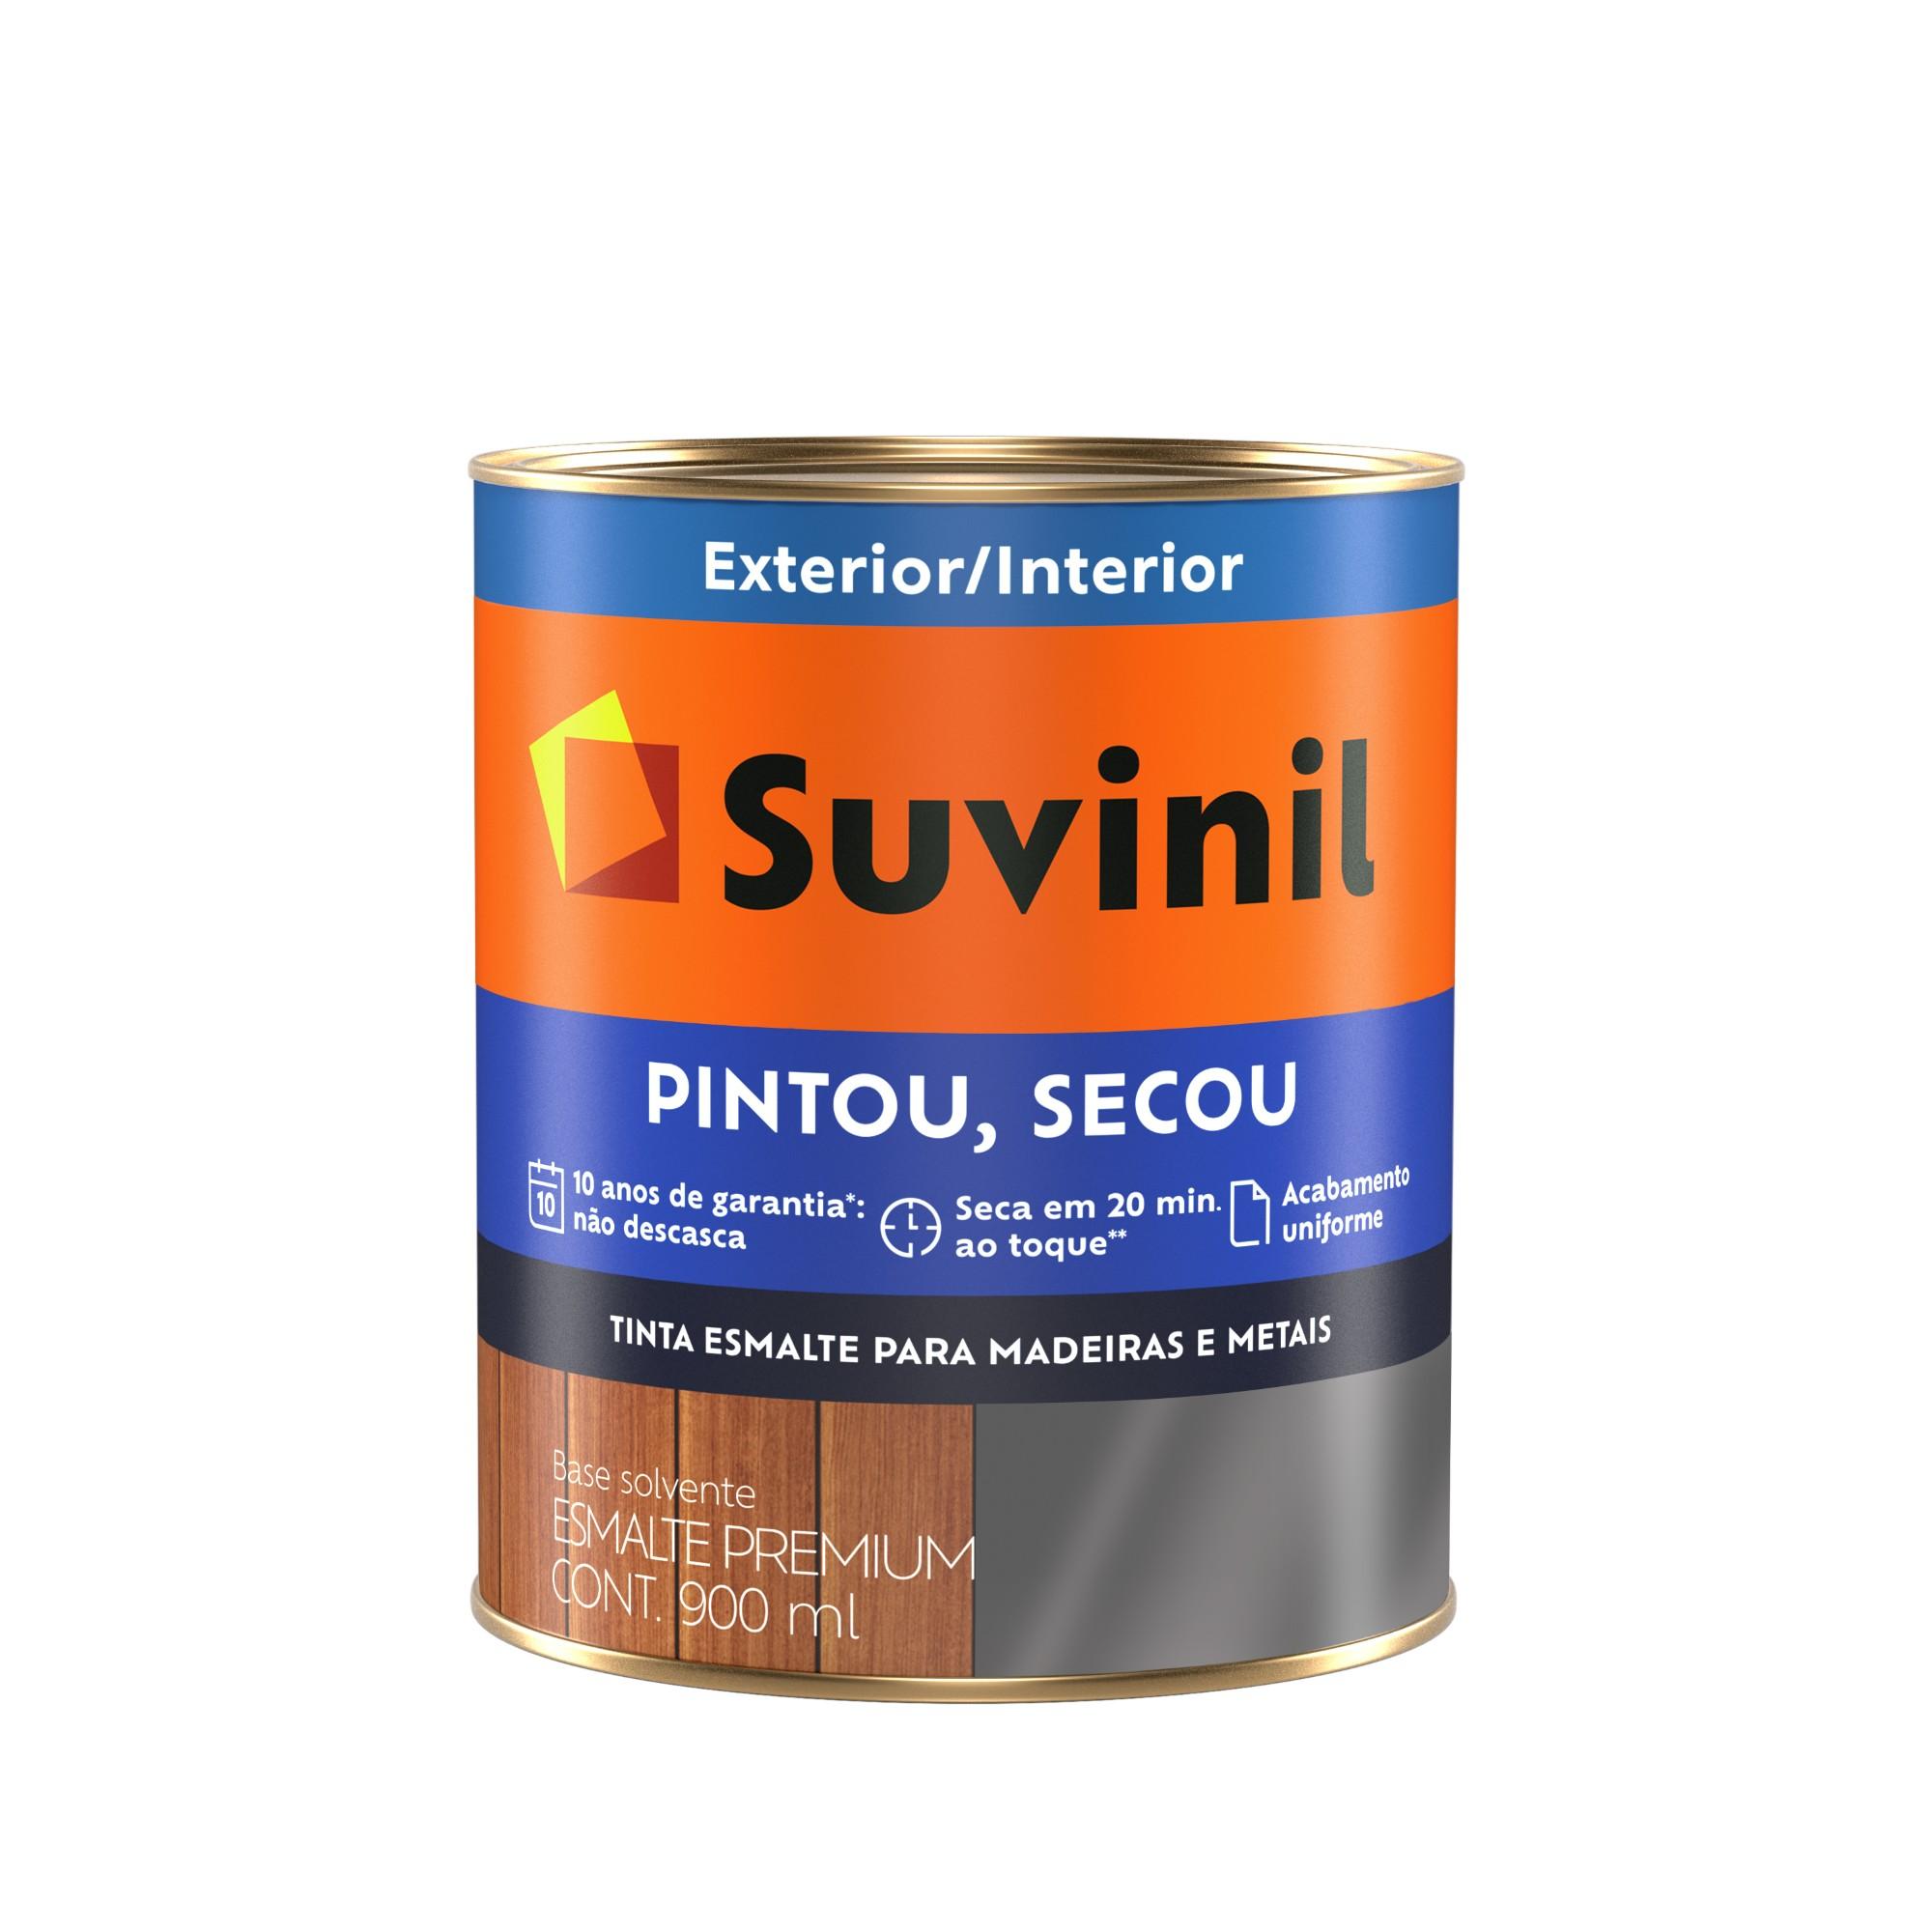 Tinta Esmalte Sintetico Brilhante Premium 09L - Cinza Medio - Pintou Secou Suvinil